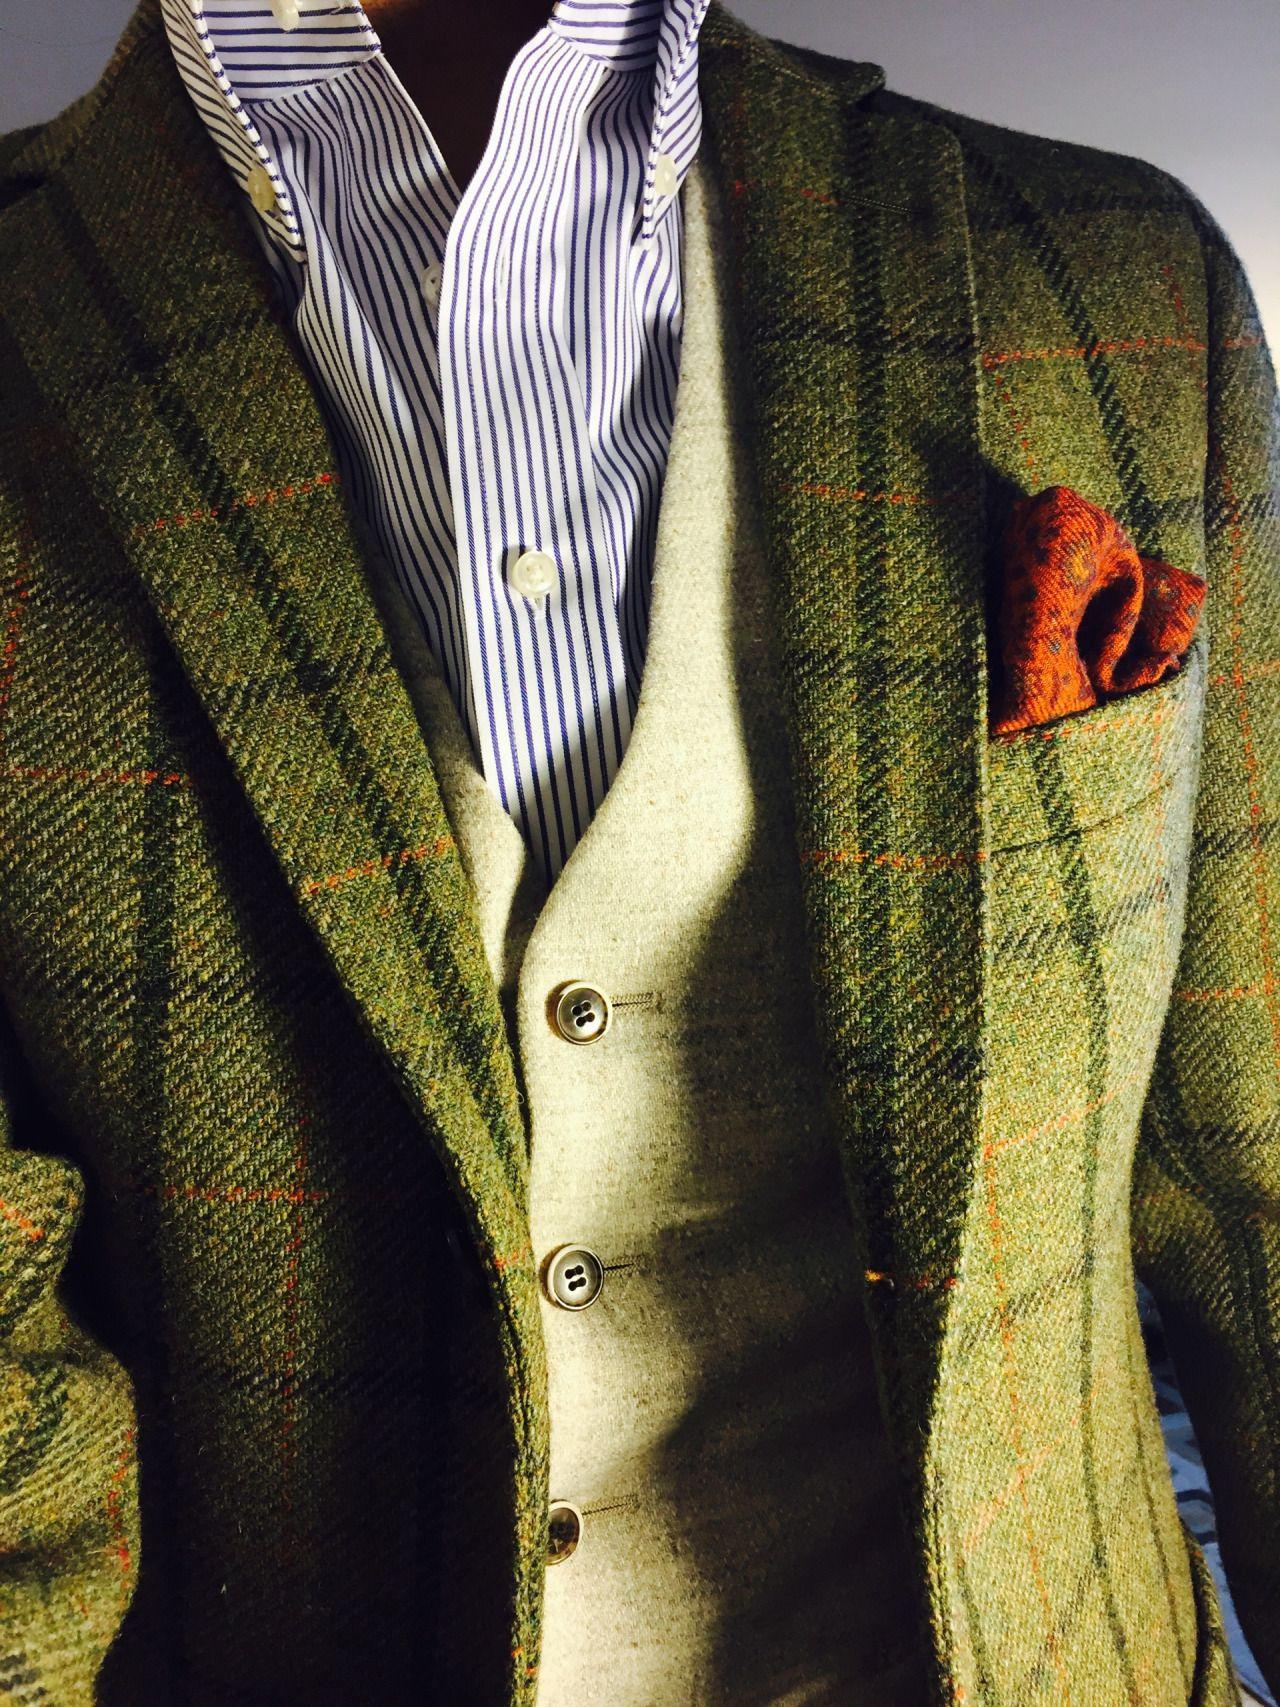 hindimiddle: 12.17.15 Tweed texture